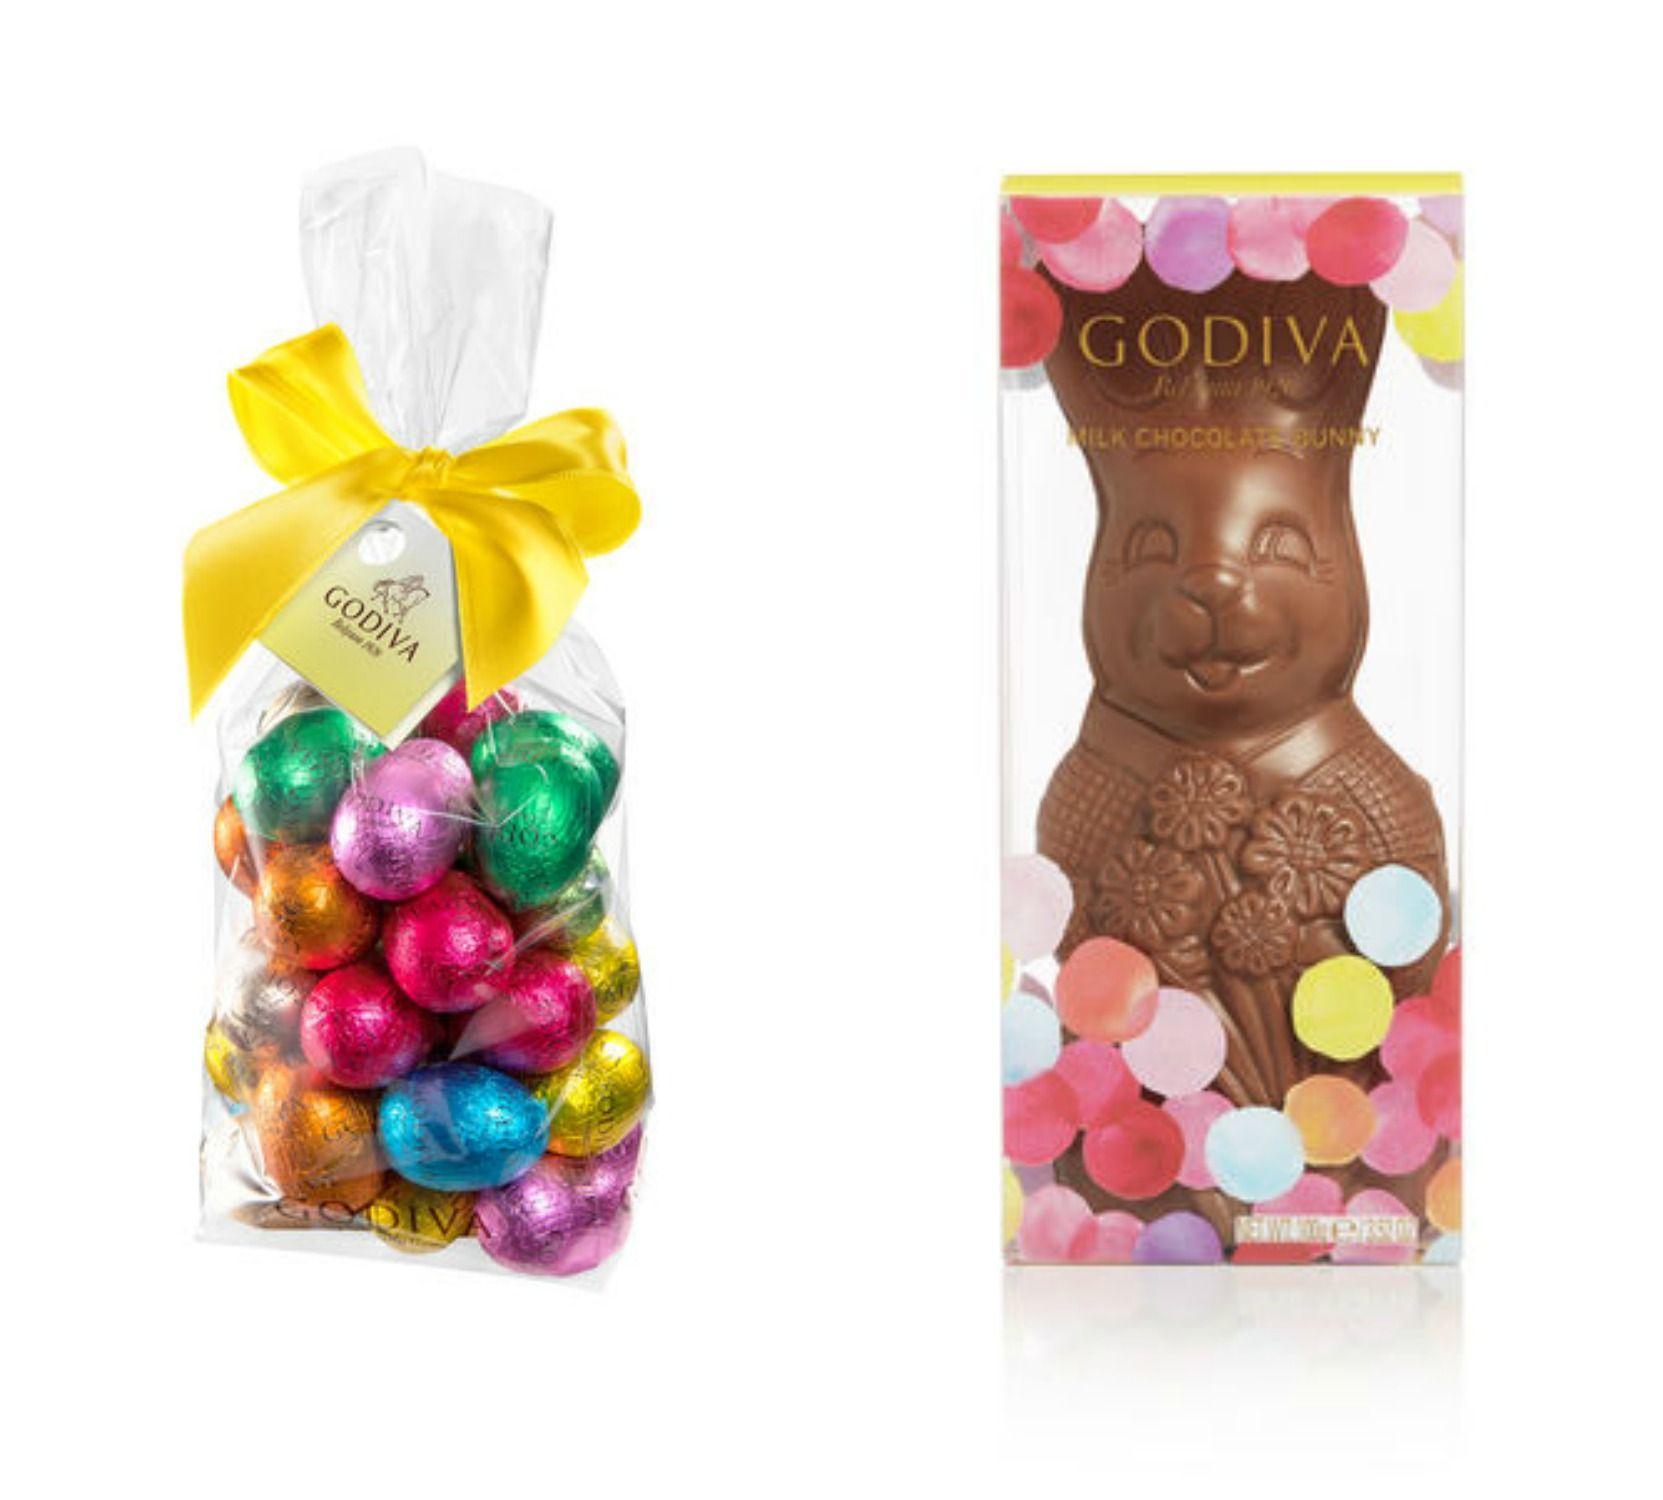 Easter egg taste test 2017 easter egg and chocolate easter egg taste test 2017 negle Image collections